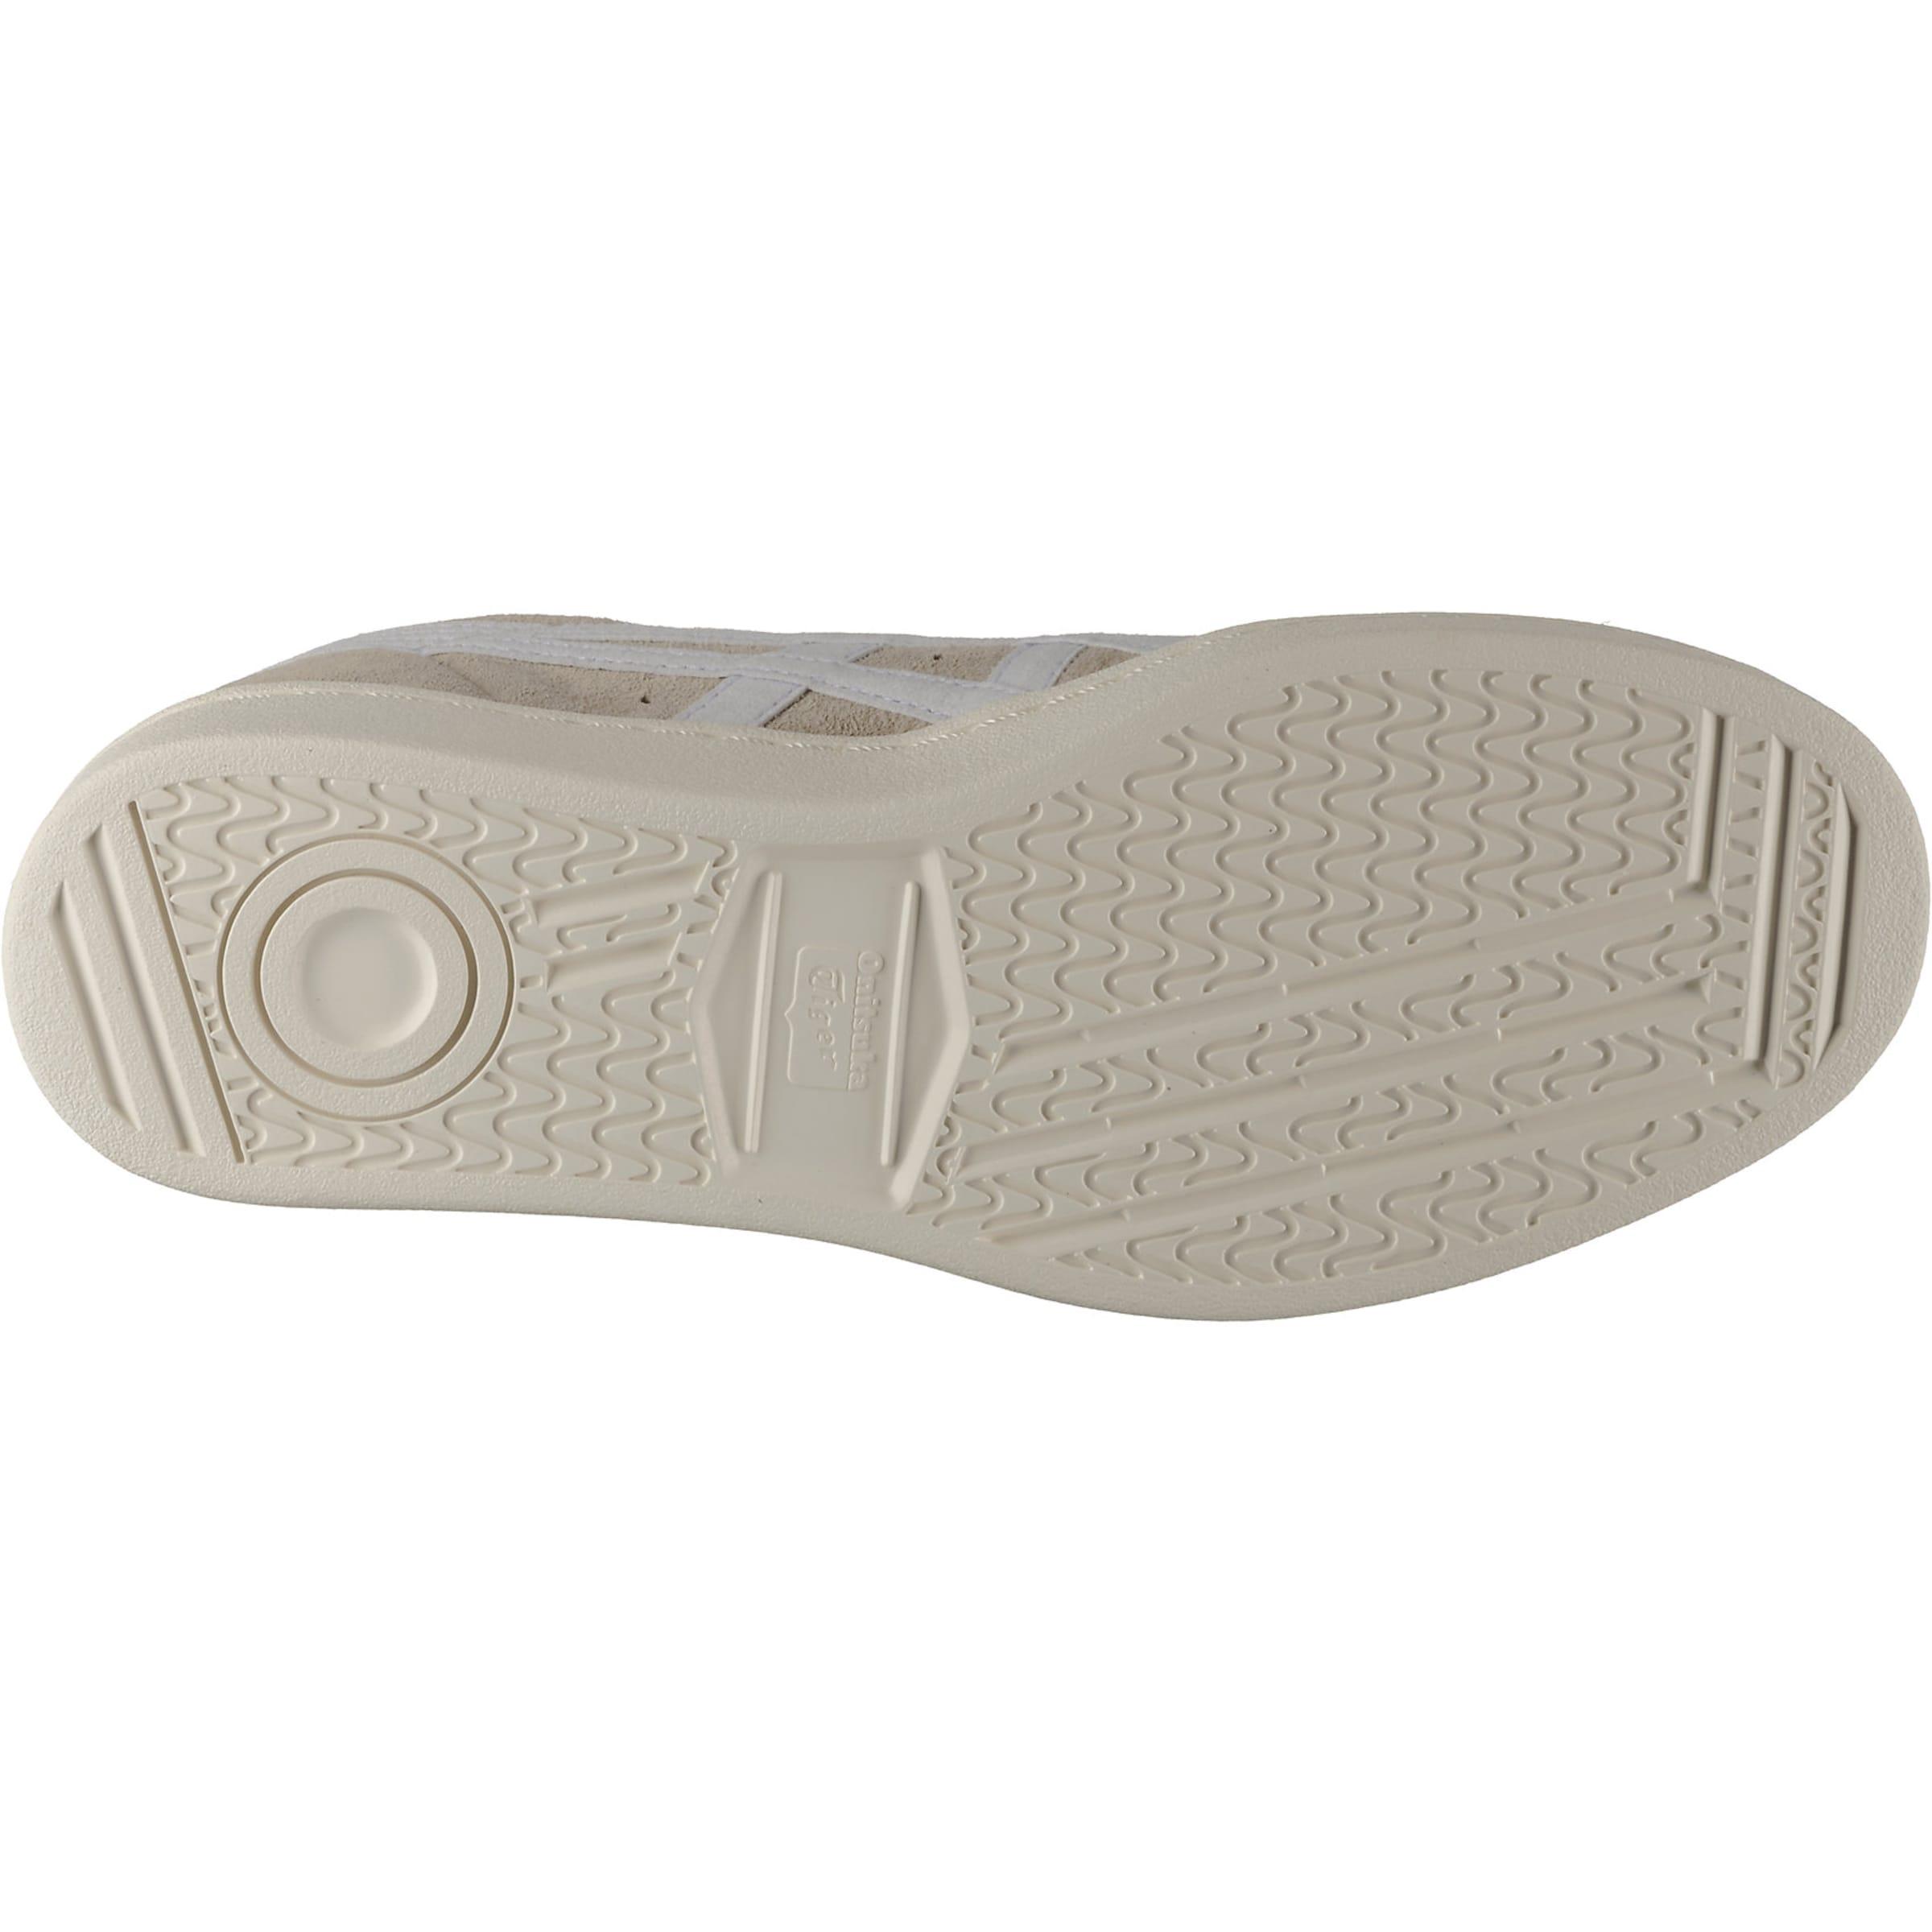 Sneaker Grau In Onitsuka Tiger wn0mN8